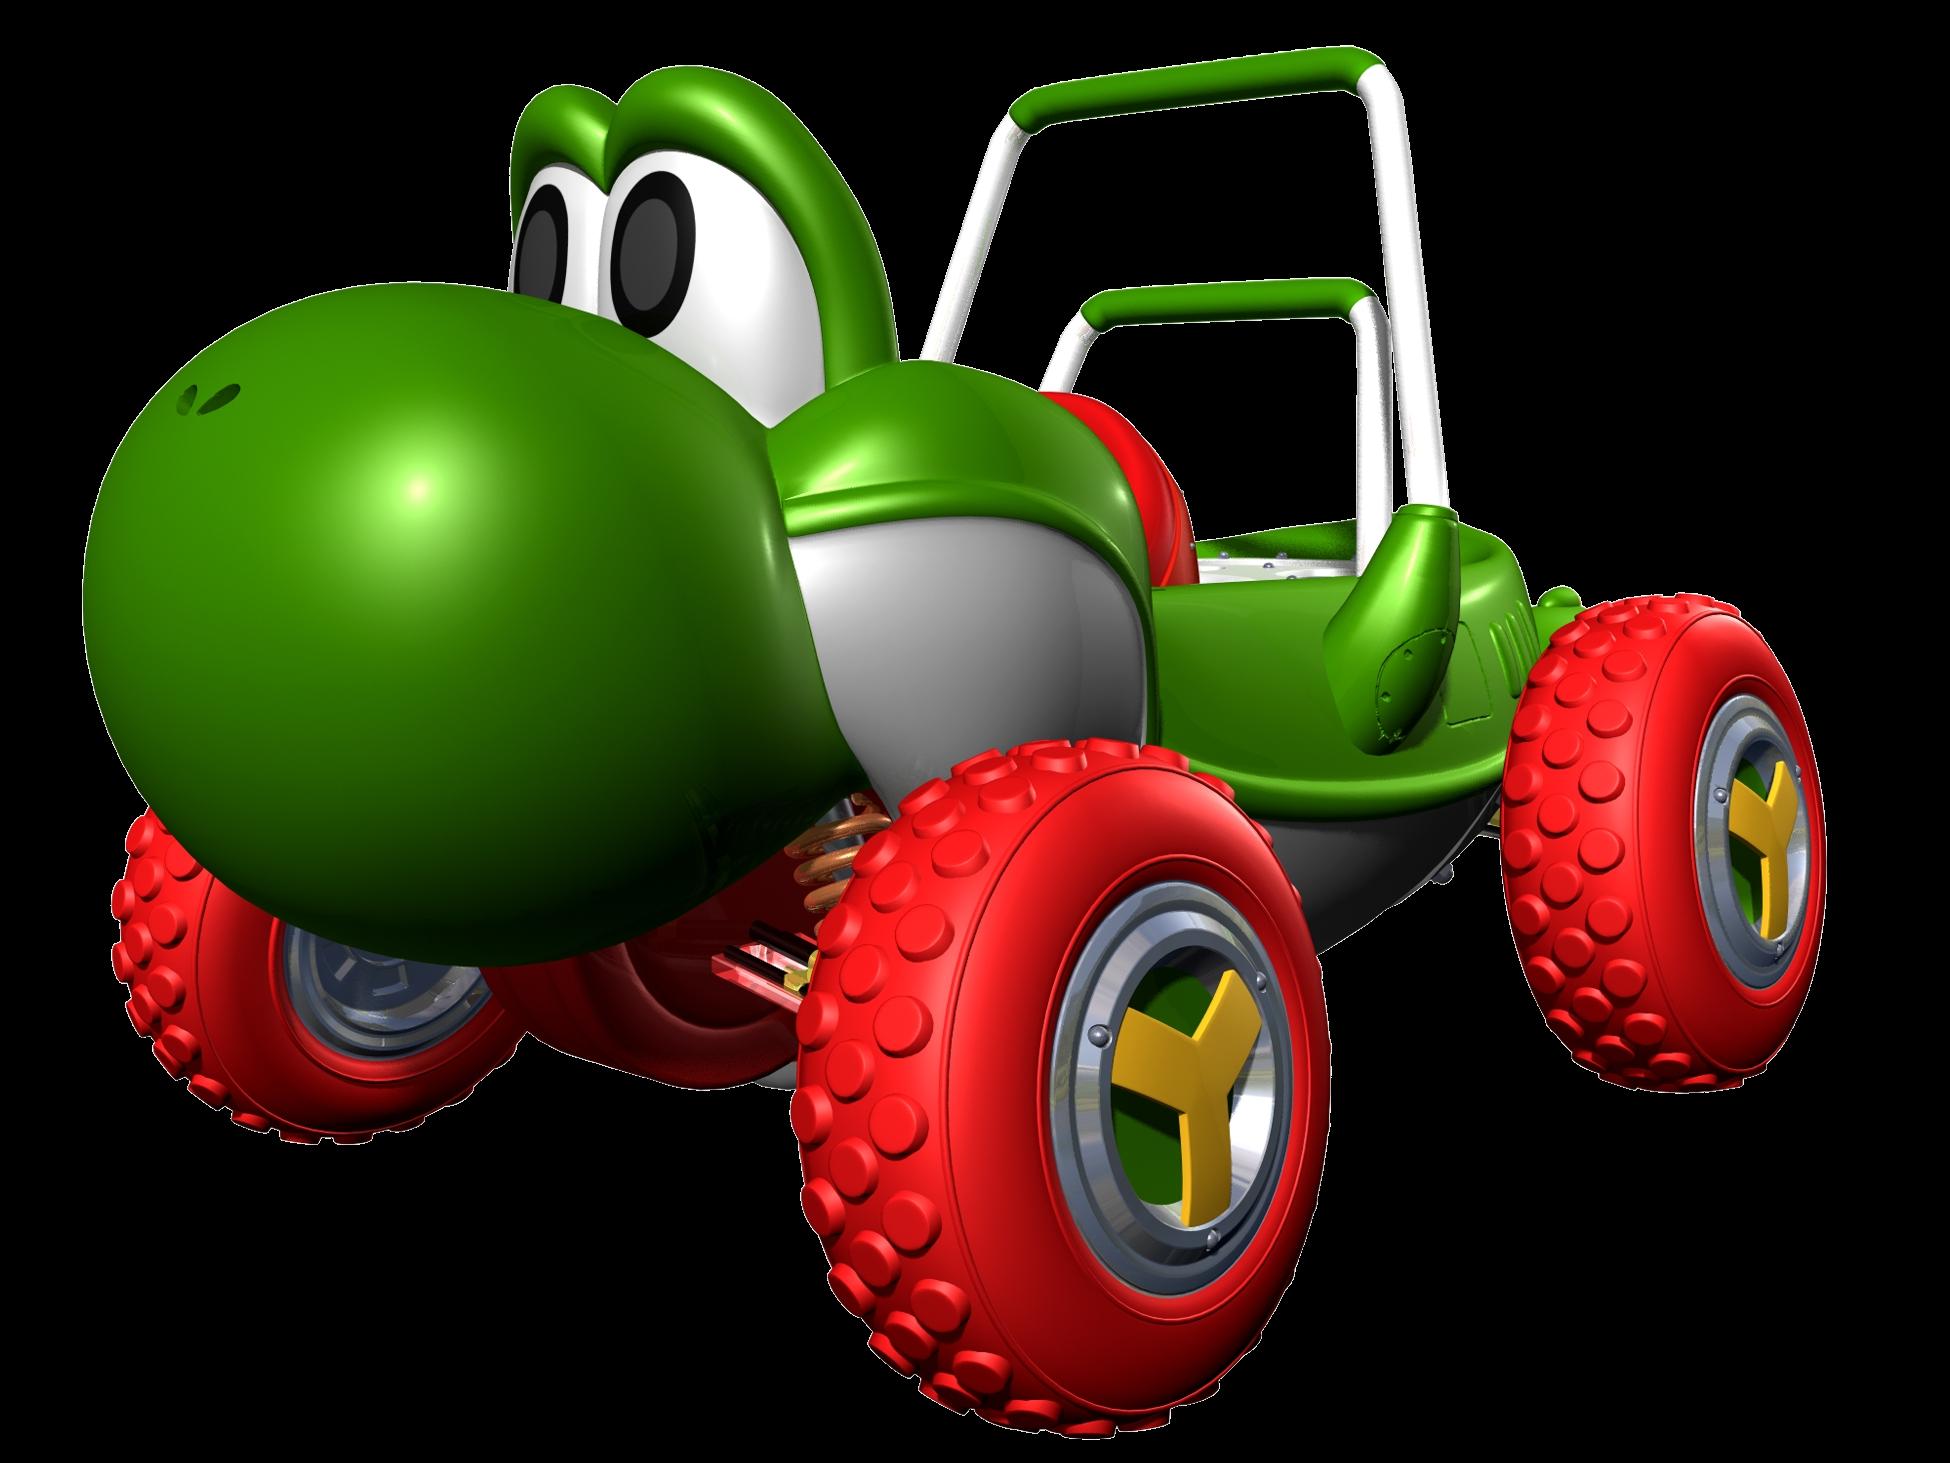 Clipart car racetrack. Mario kart double dash